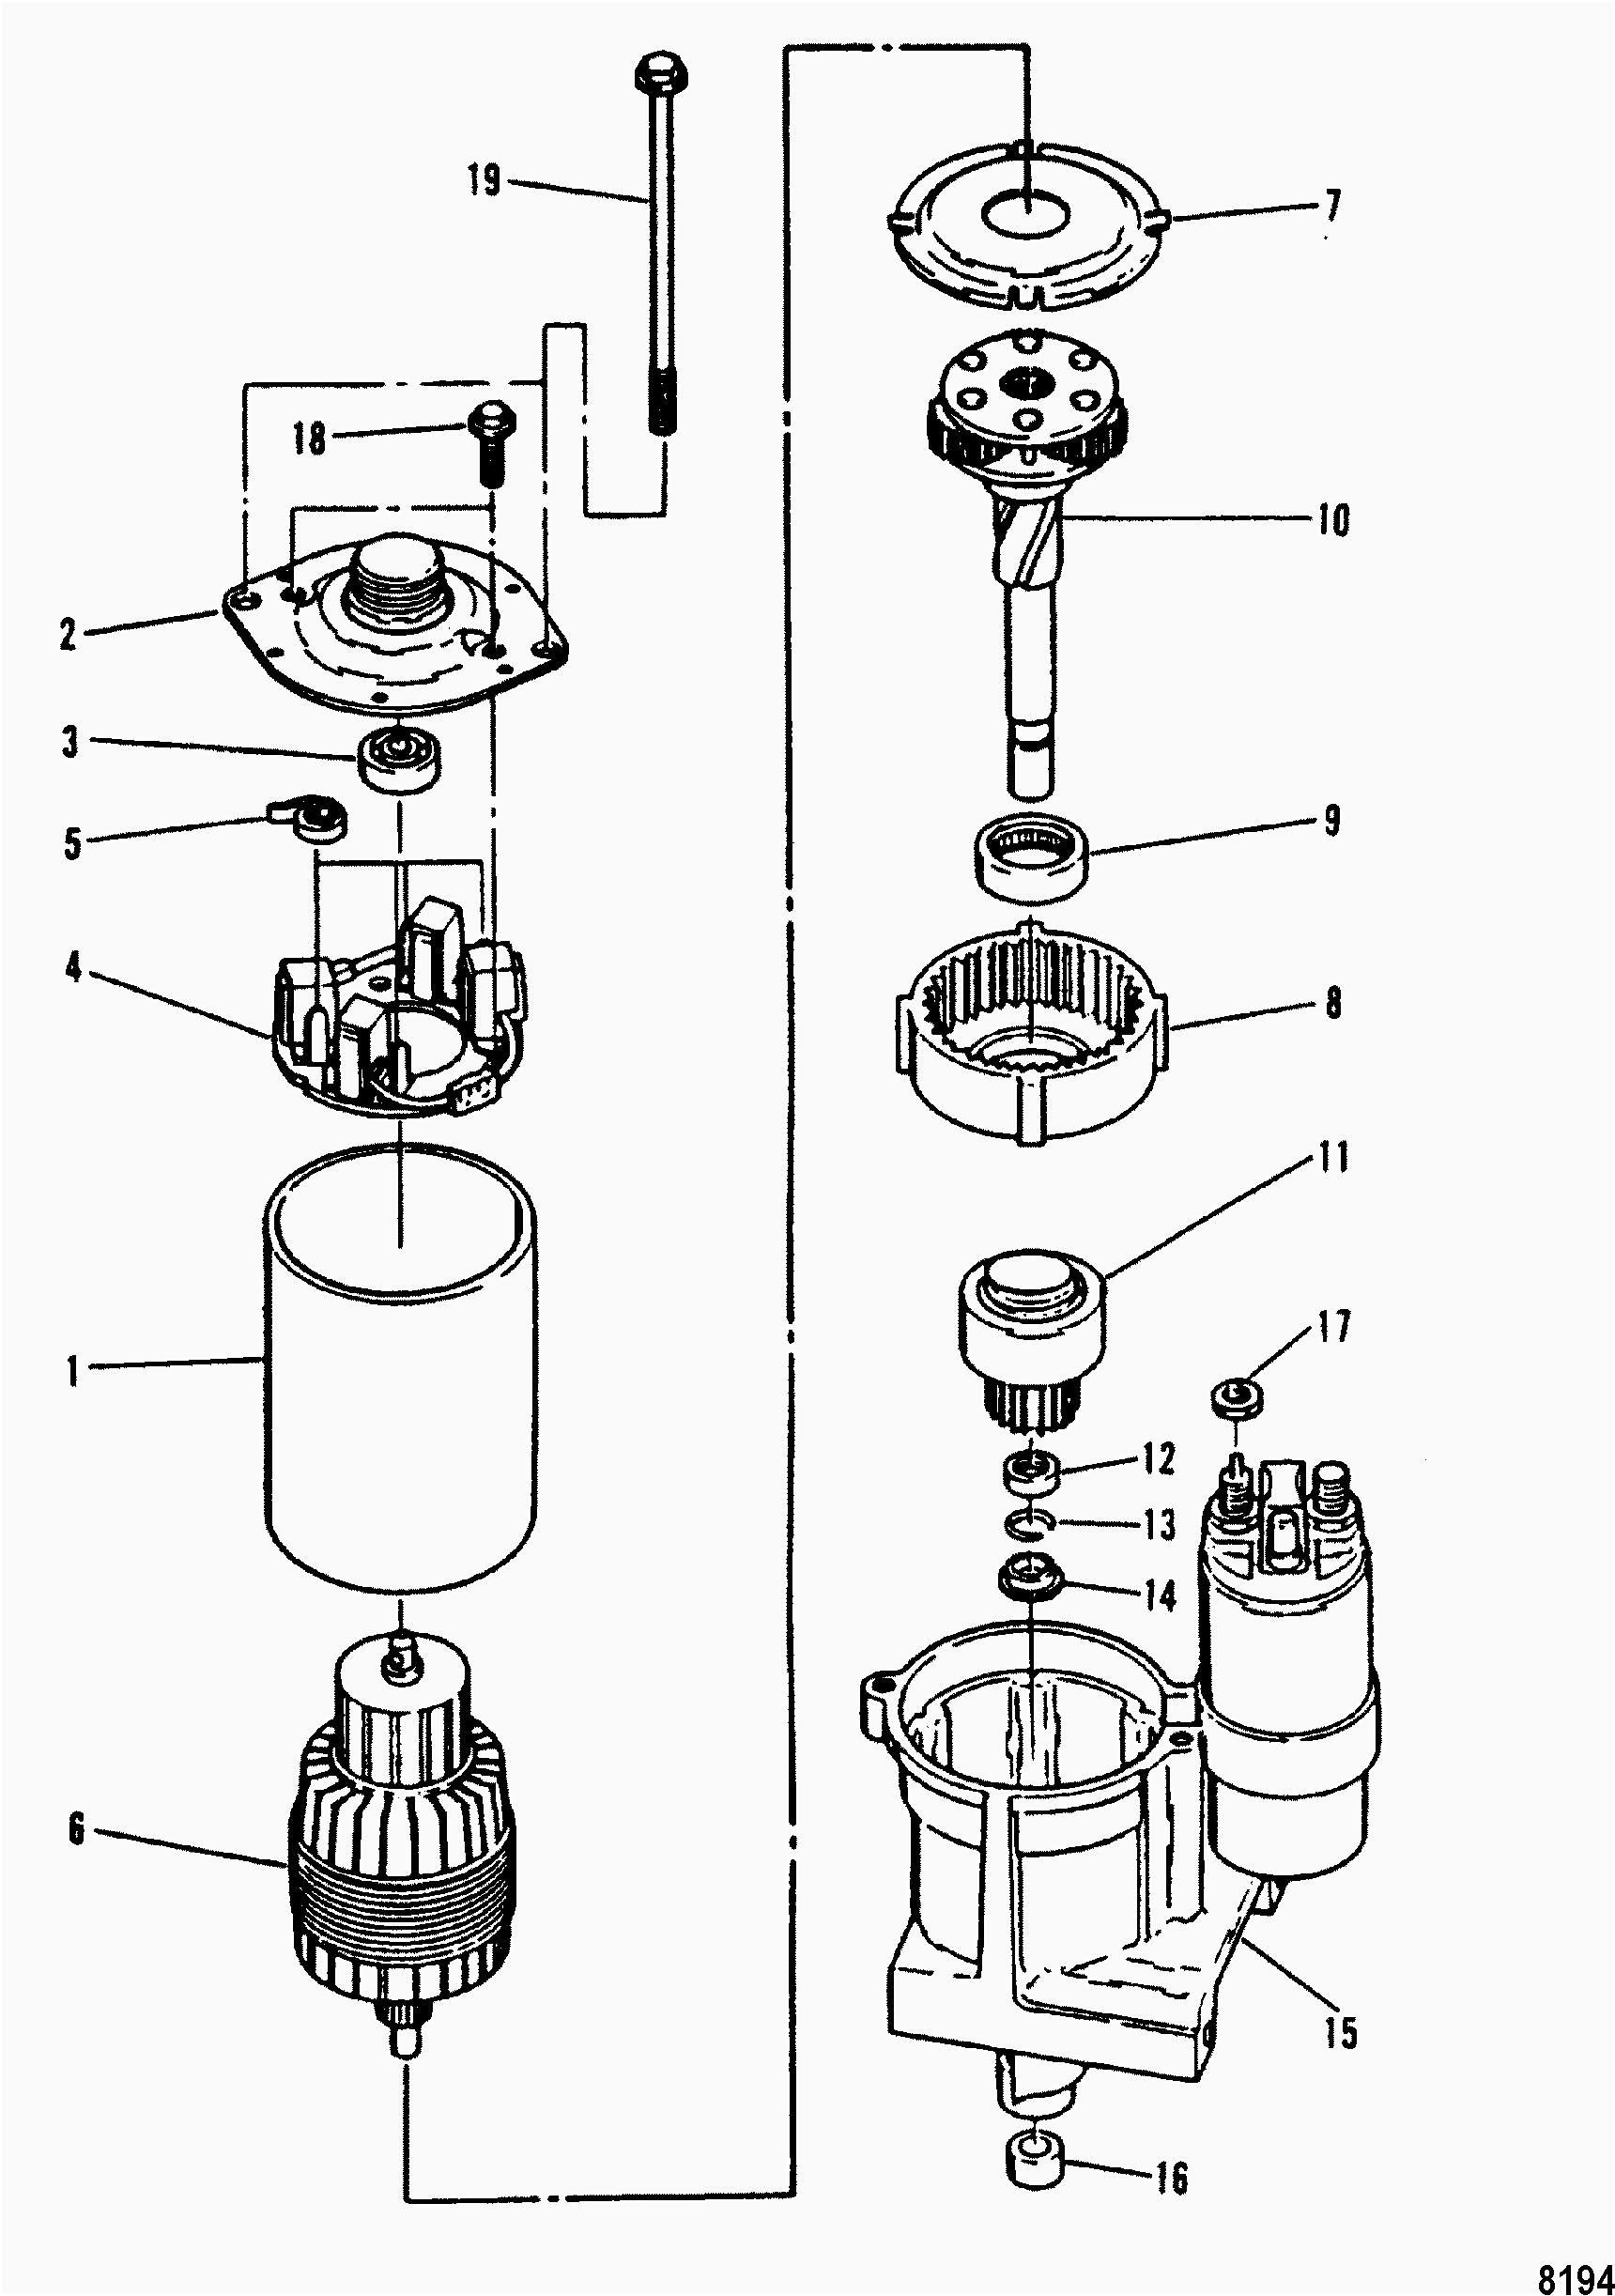 Delco Alternator To Regulator Wiring